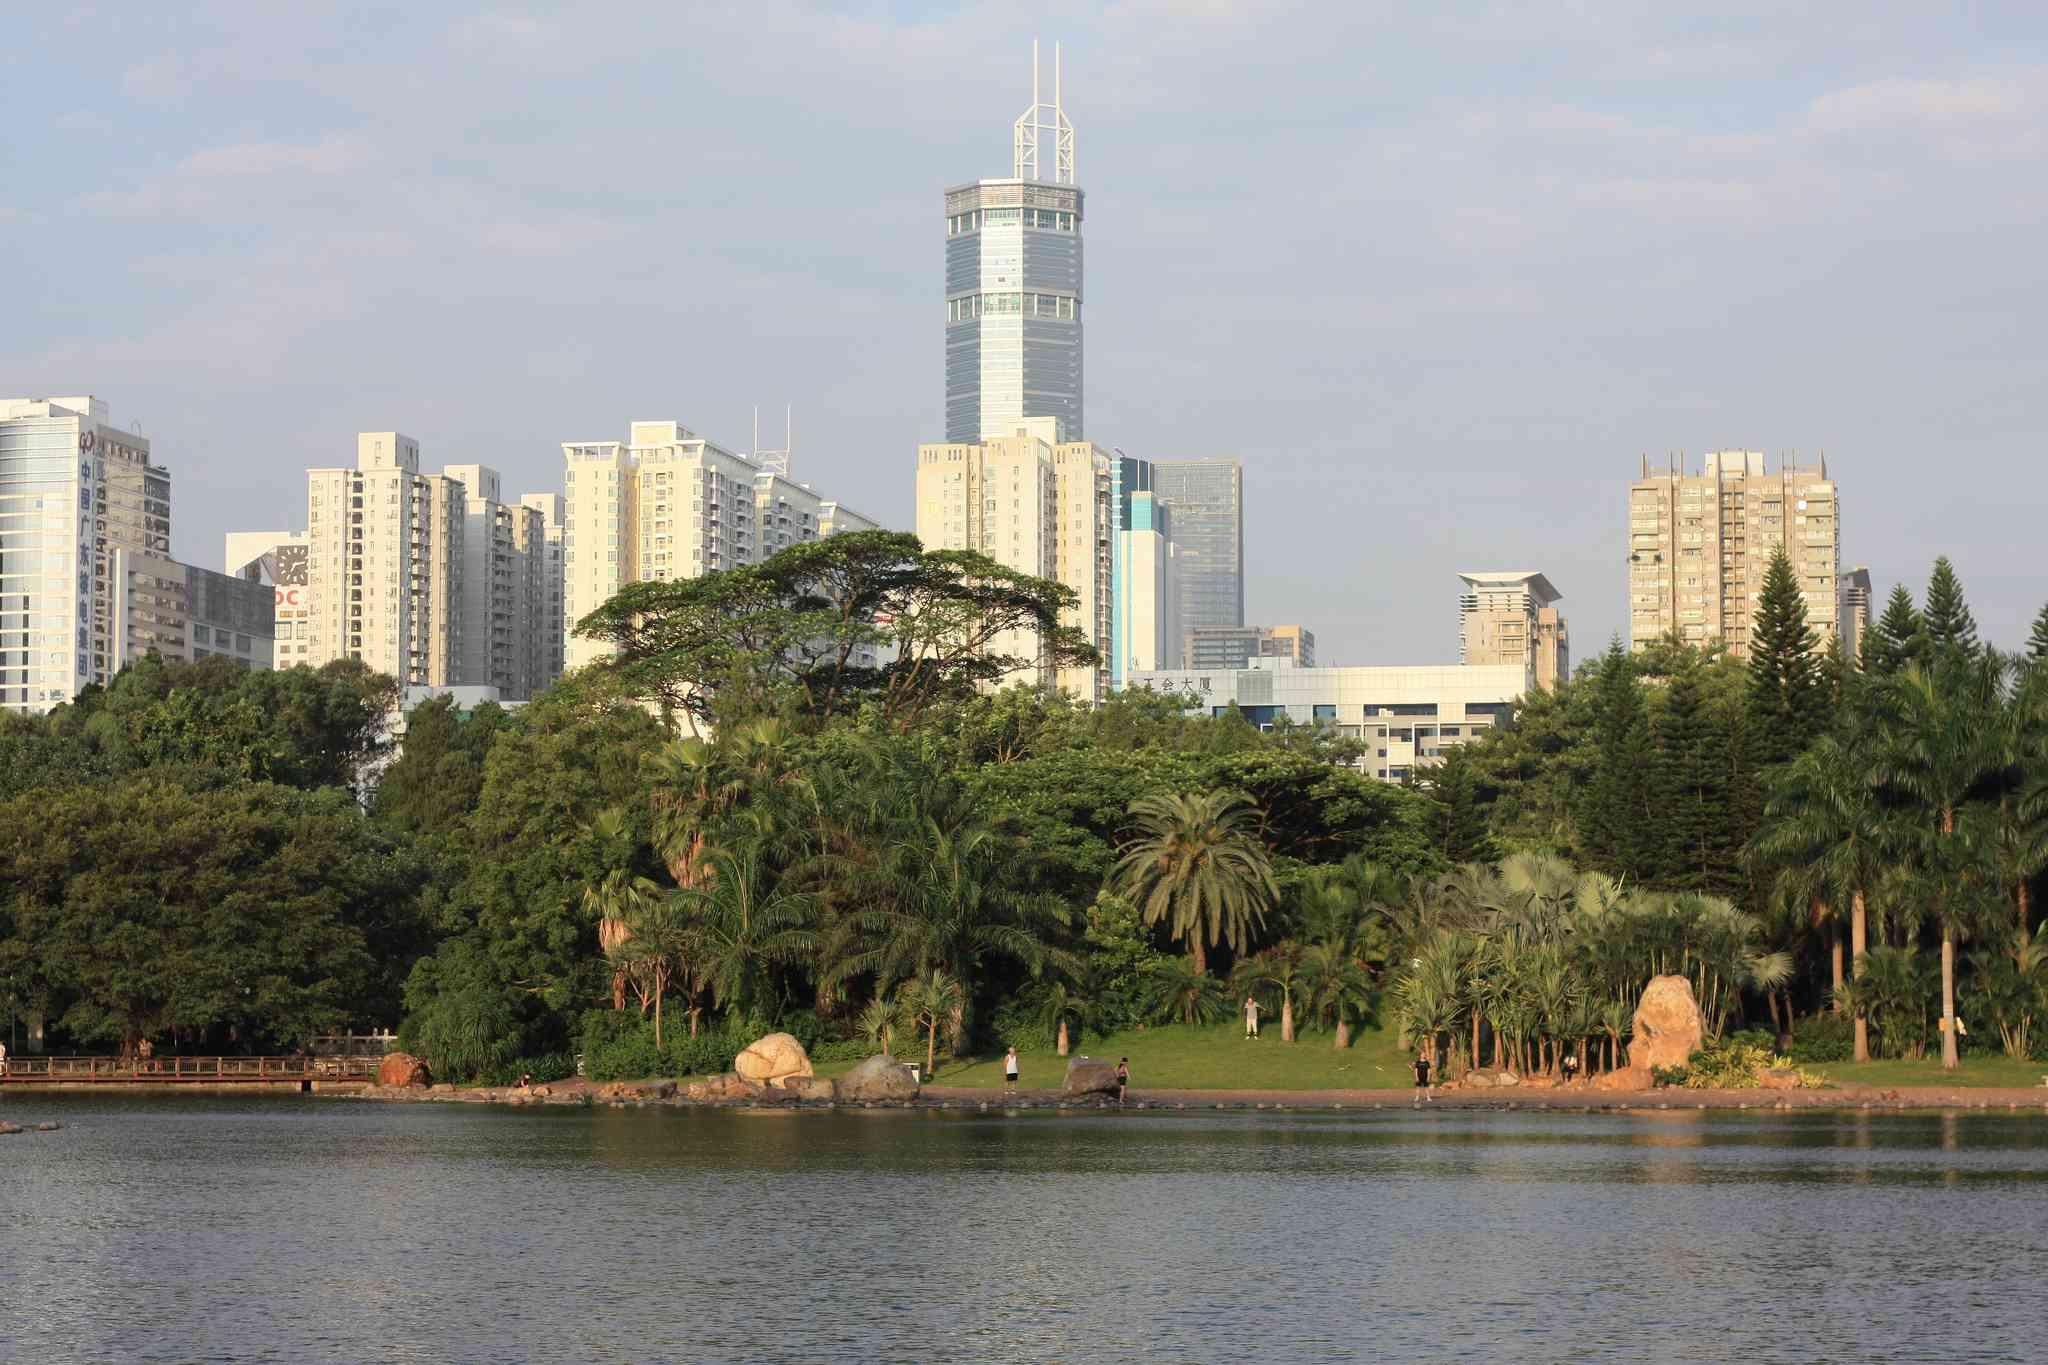 Lizhi Park in Shenzhen, China